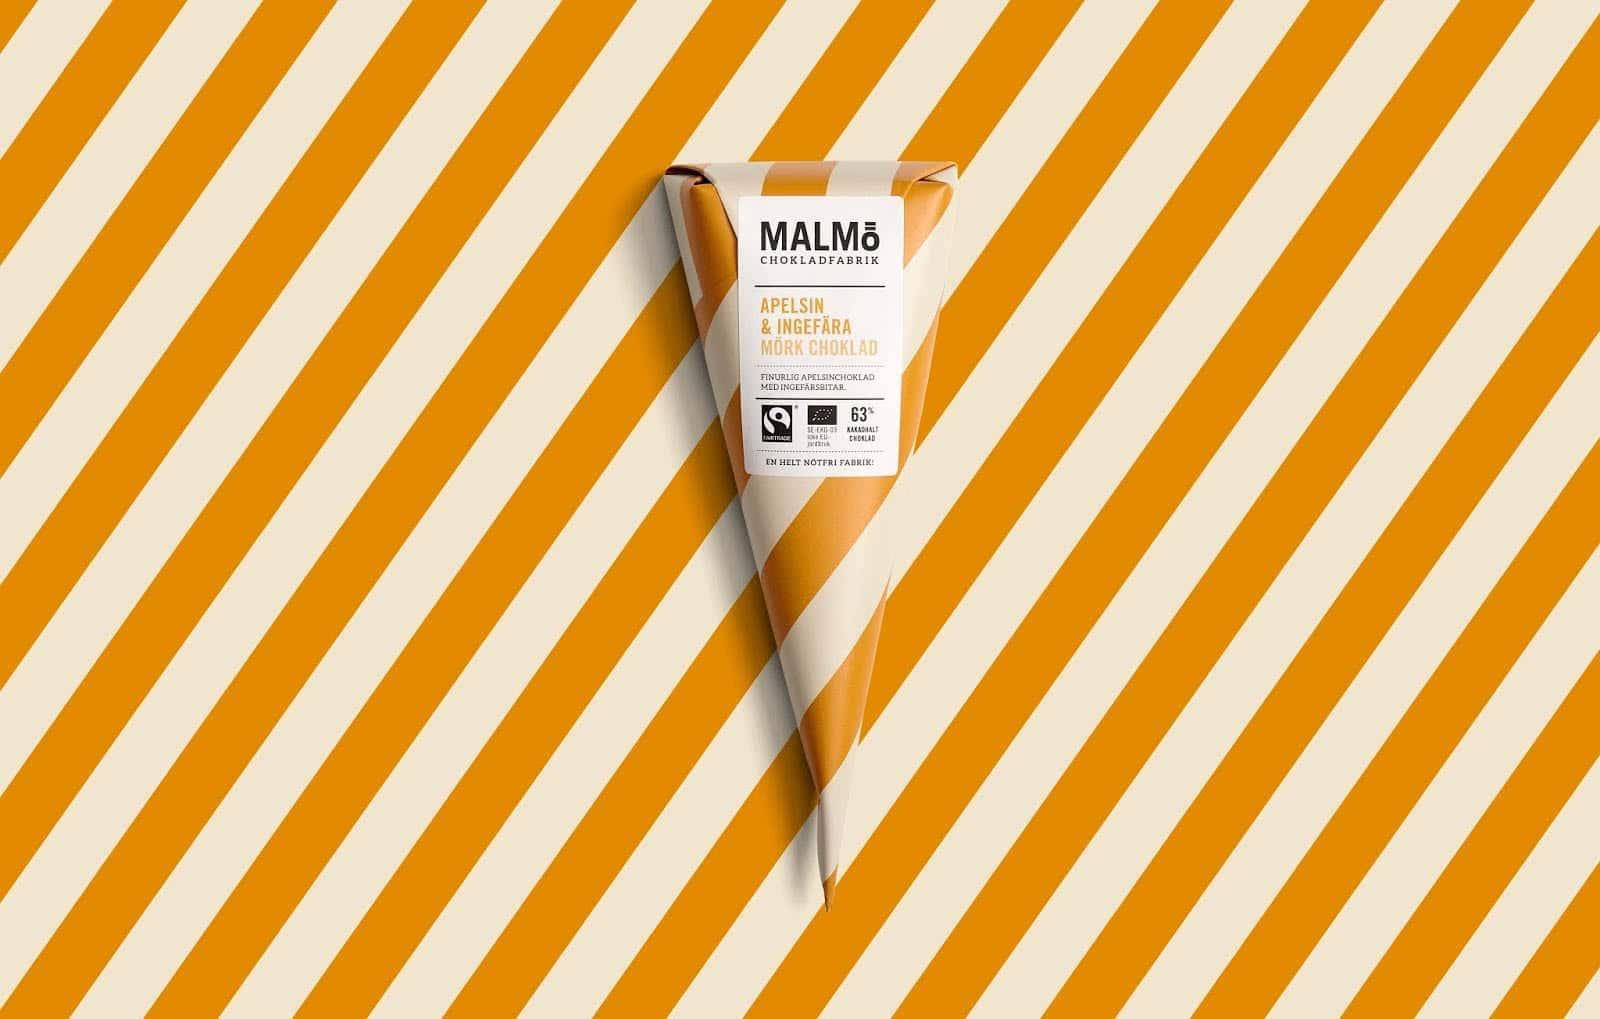 pond-design-malmo-chokladfabrik packaging a strisce